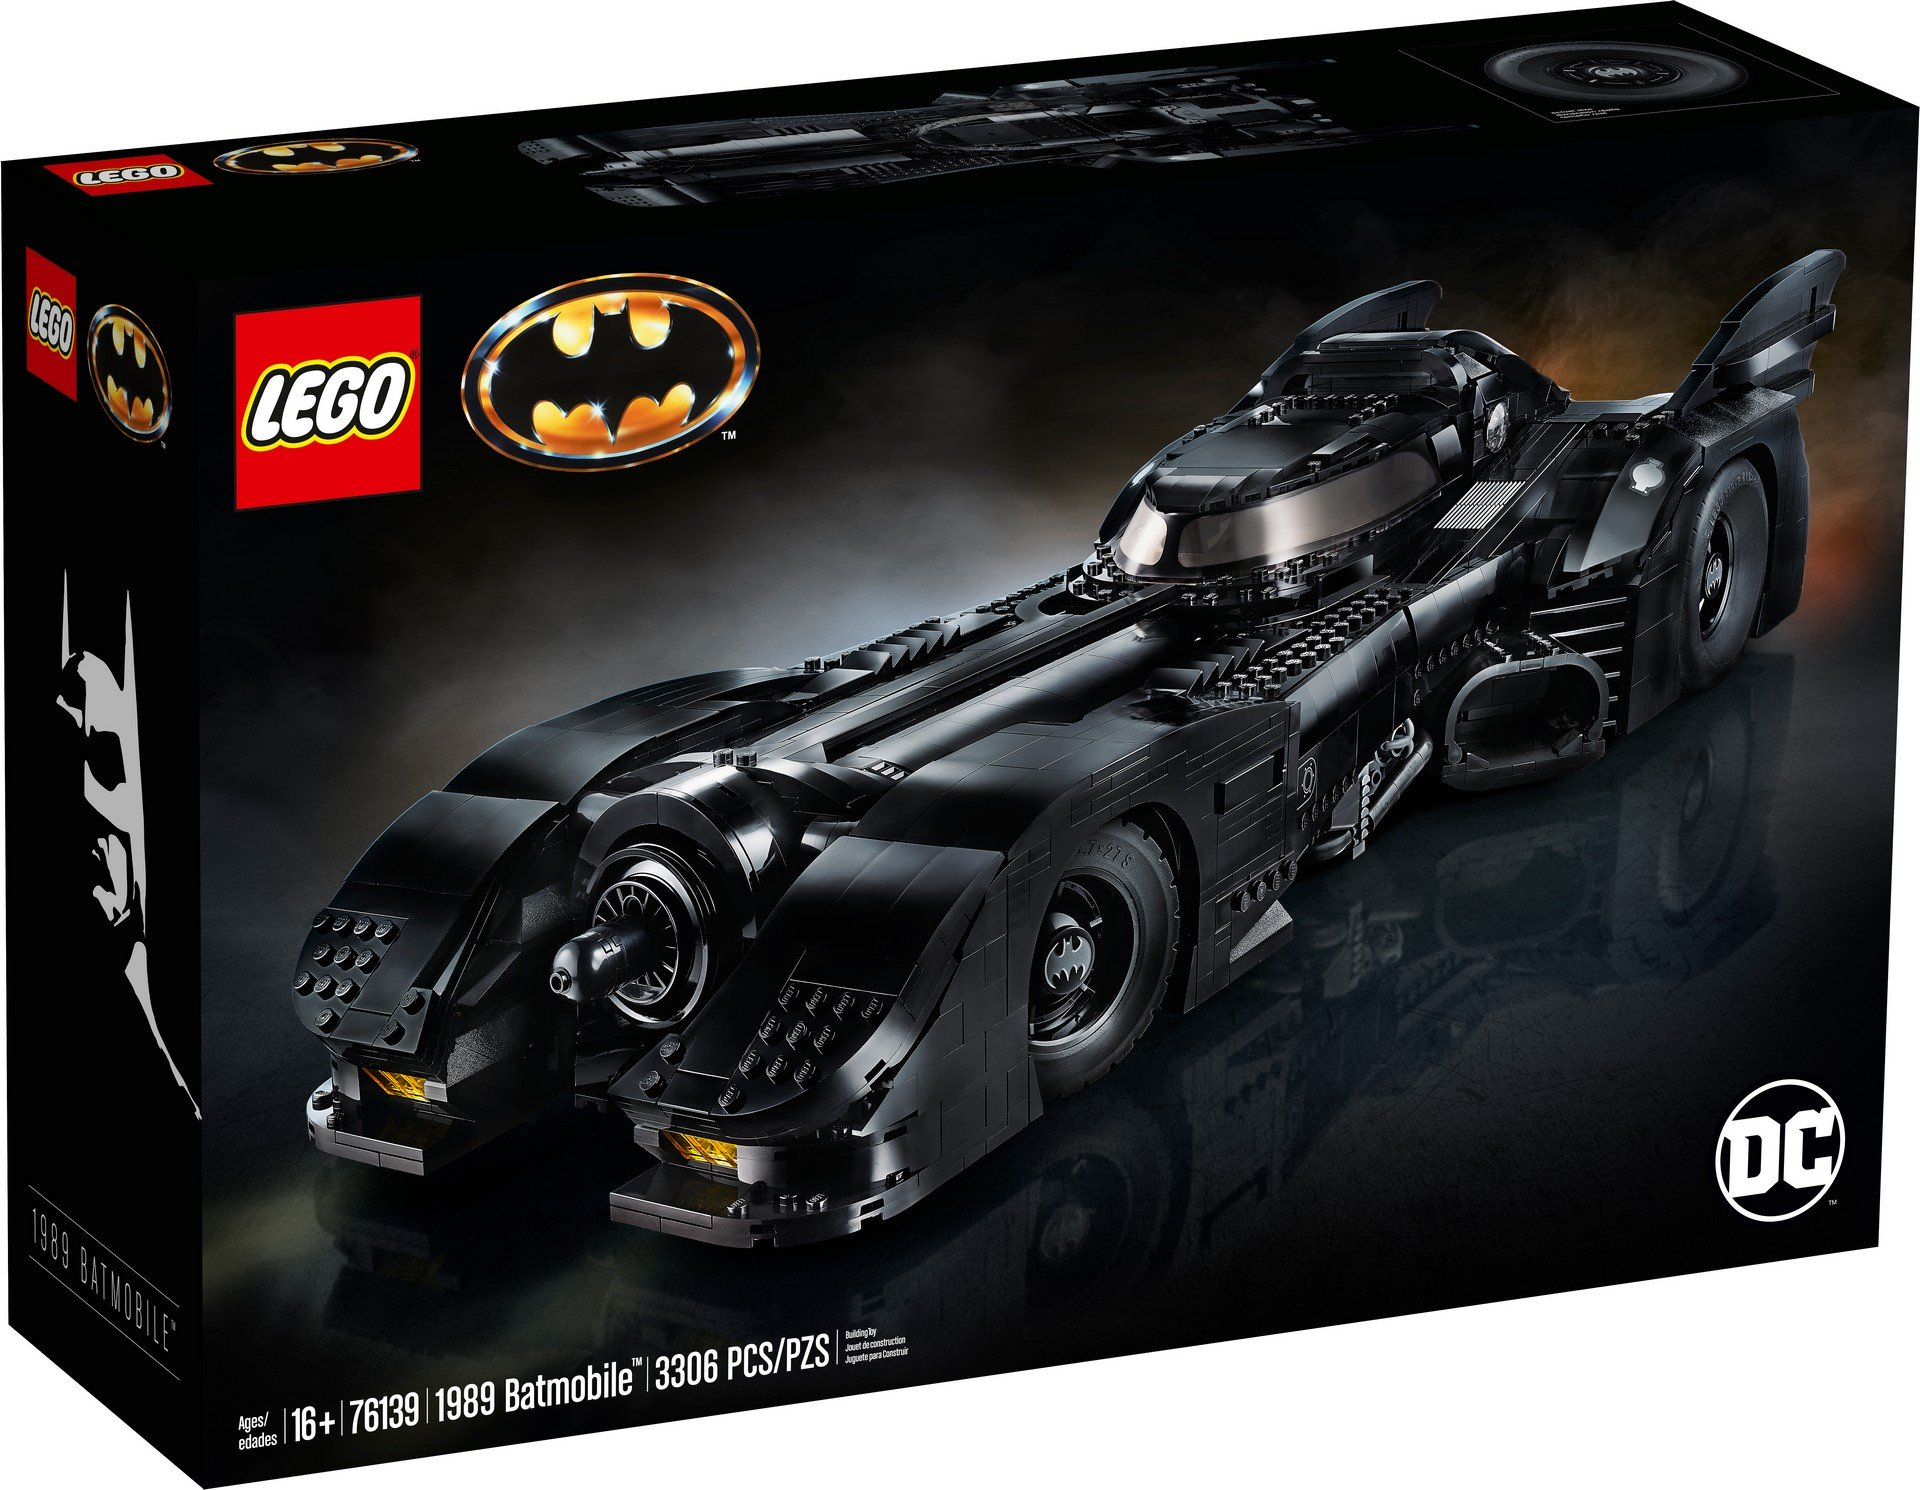 Lego-Batmobile-kit-1989-17